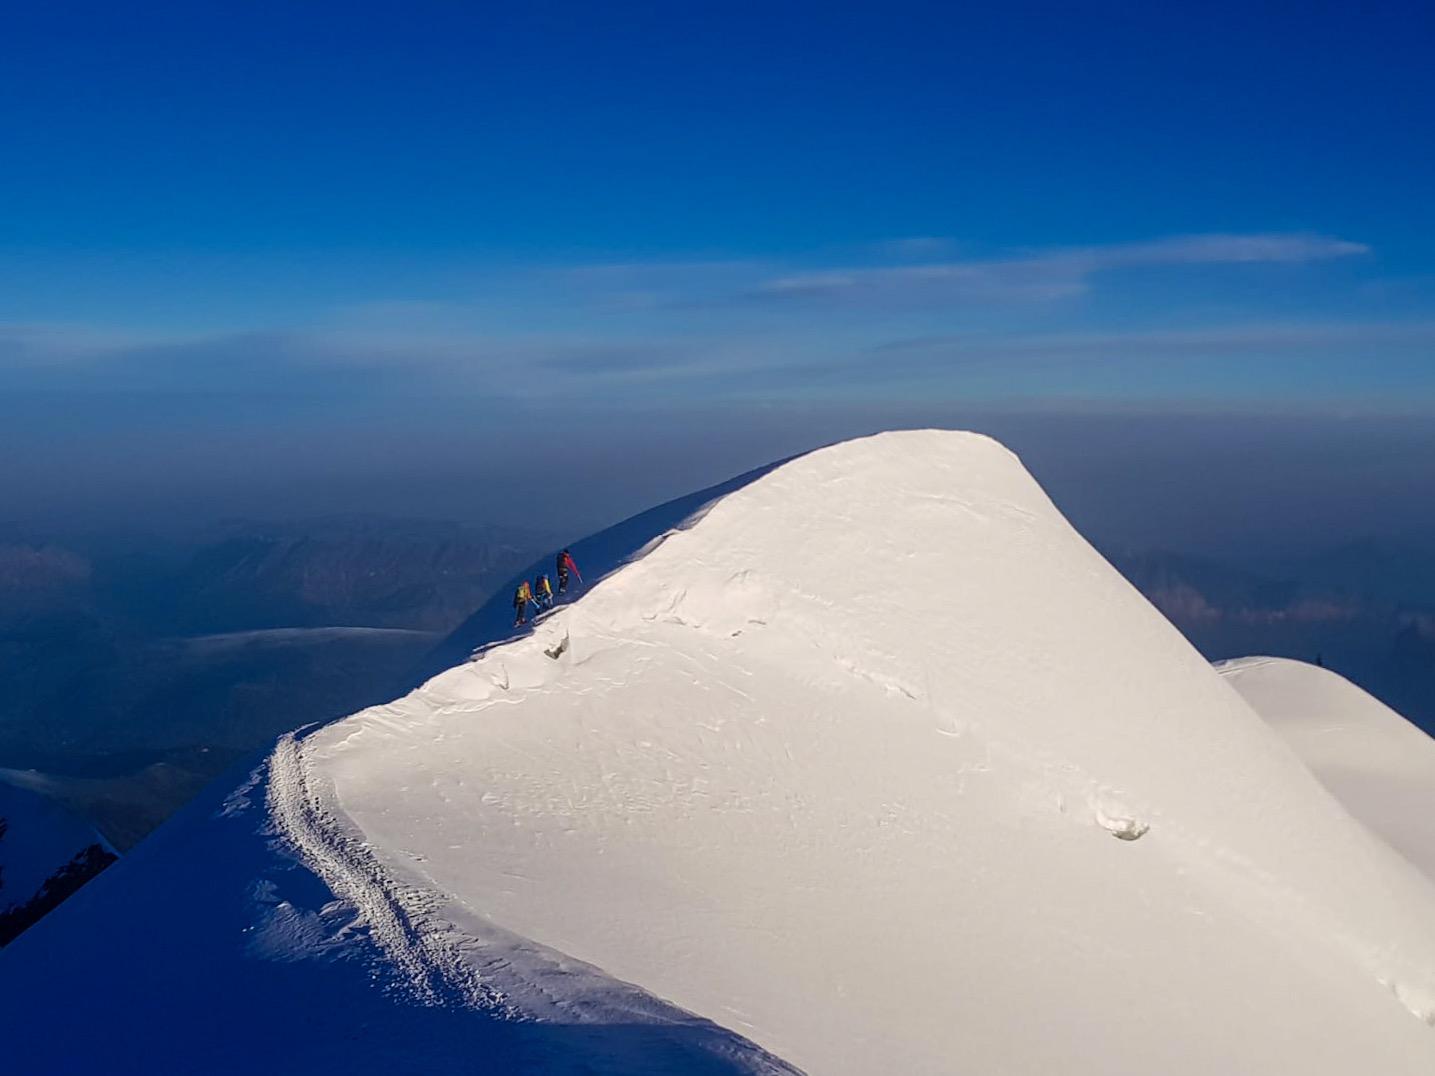 Mont blanc 2018 1